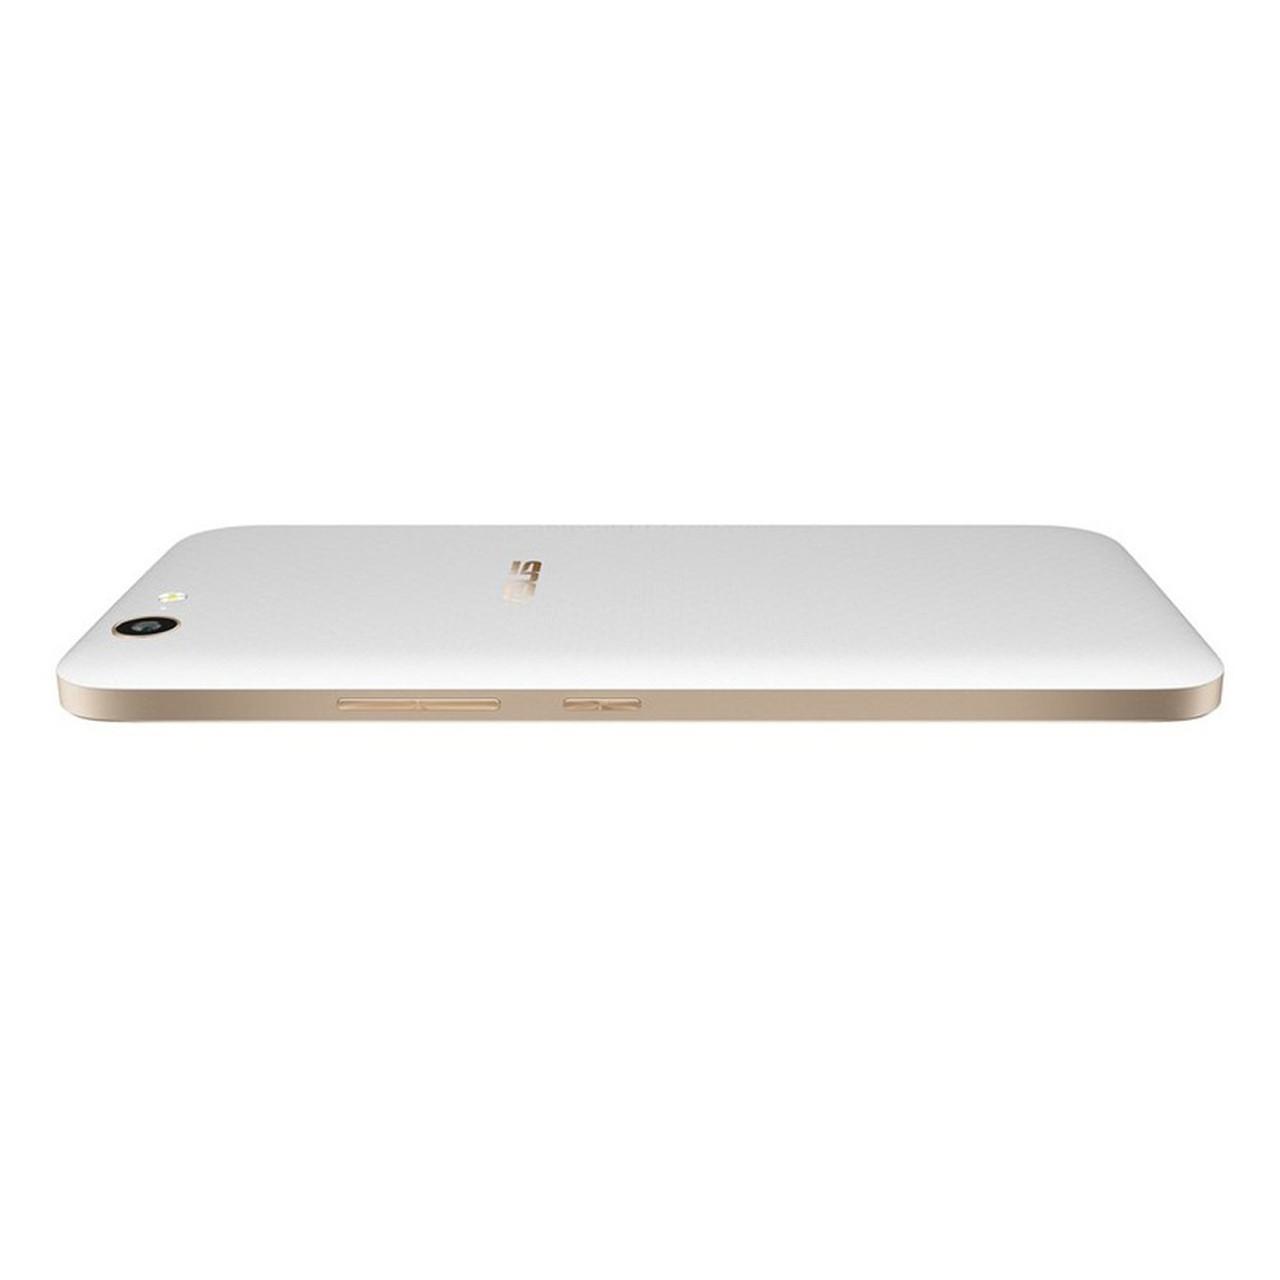 asus pegasus 5000 white 1 3ghz octa core 5 5